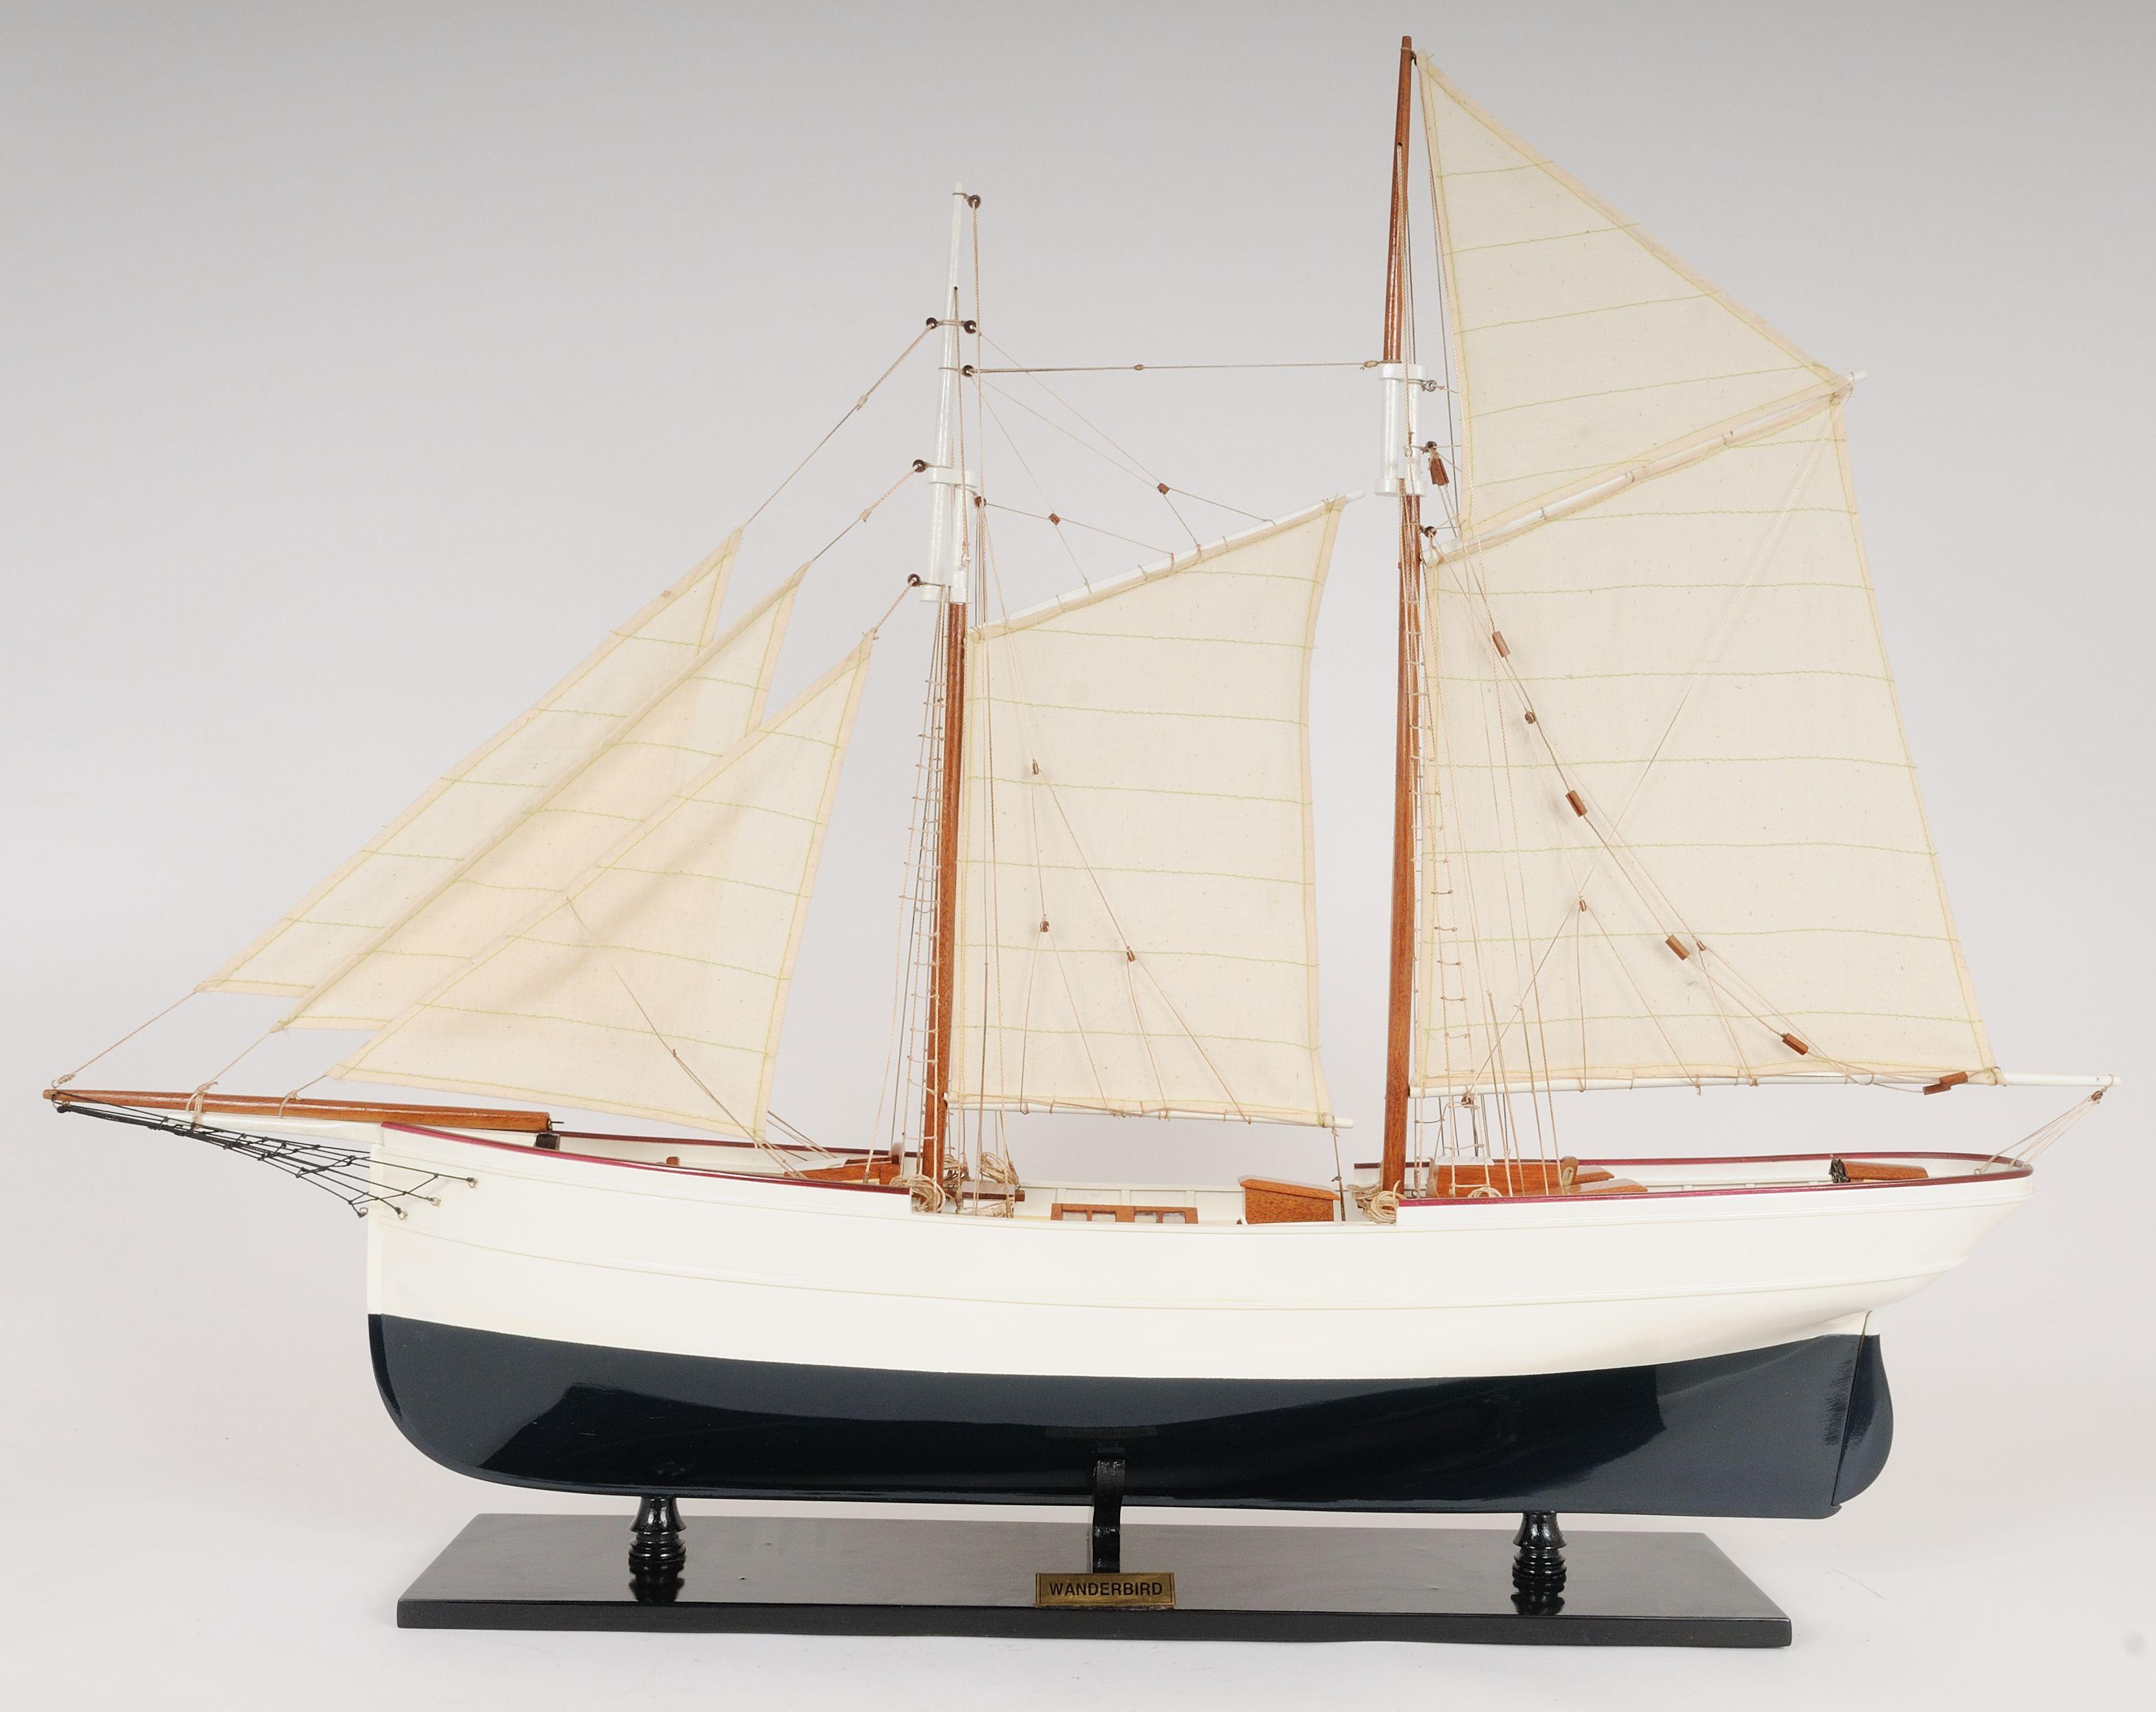 2245-13192-Wanderbird-Wooden-Model-Ship